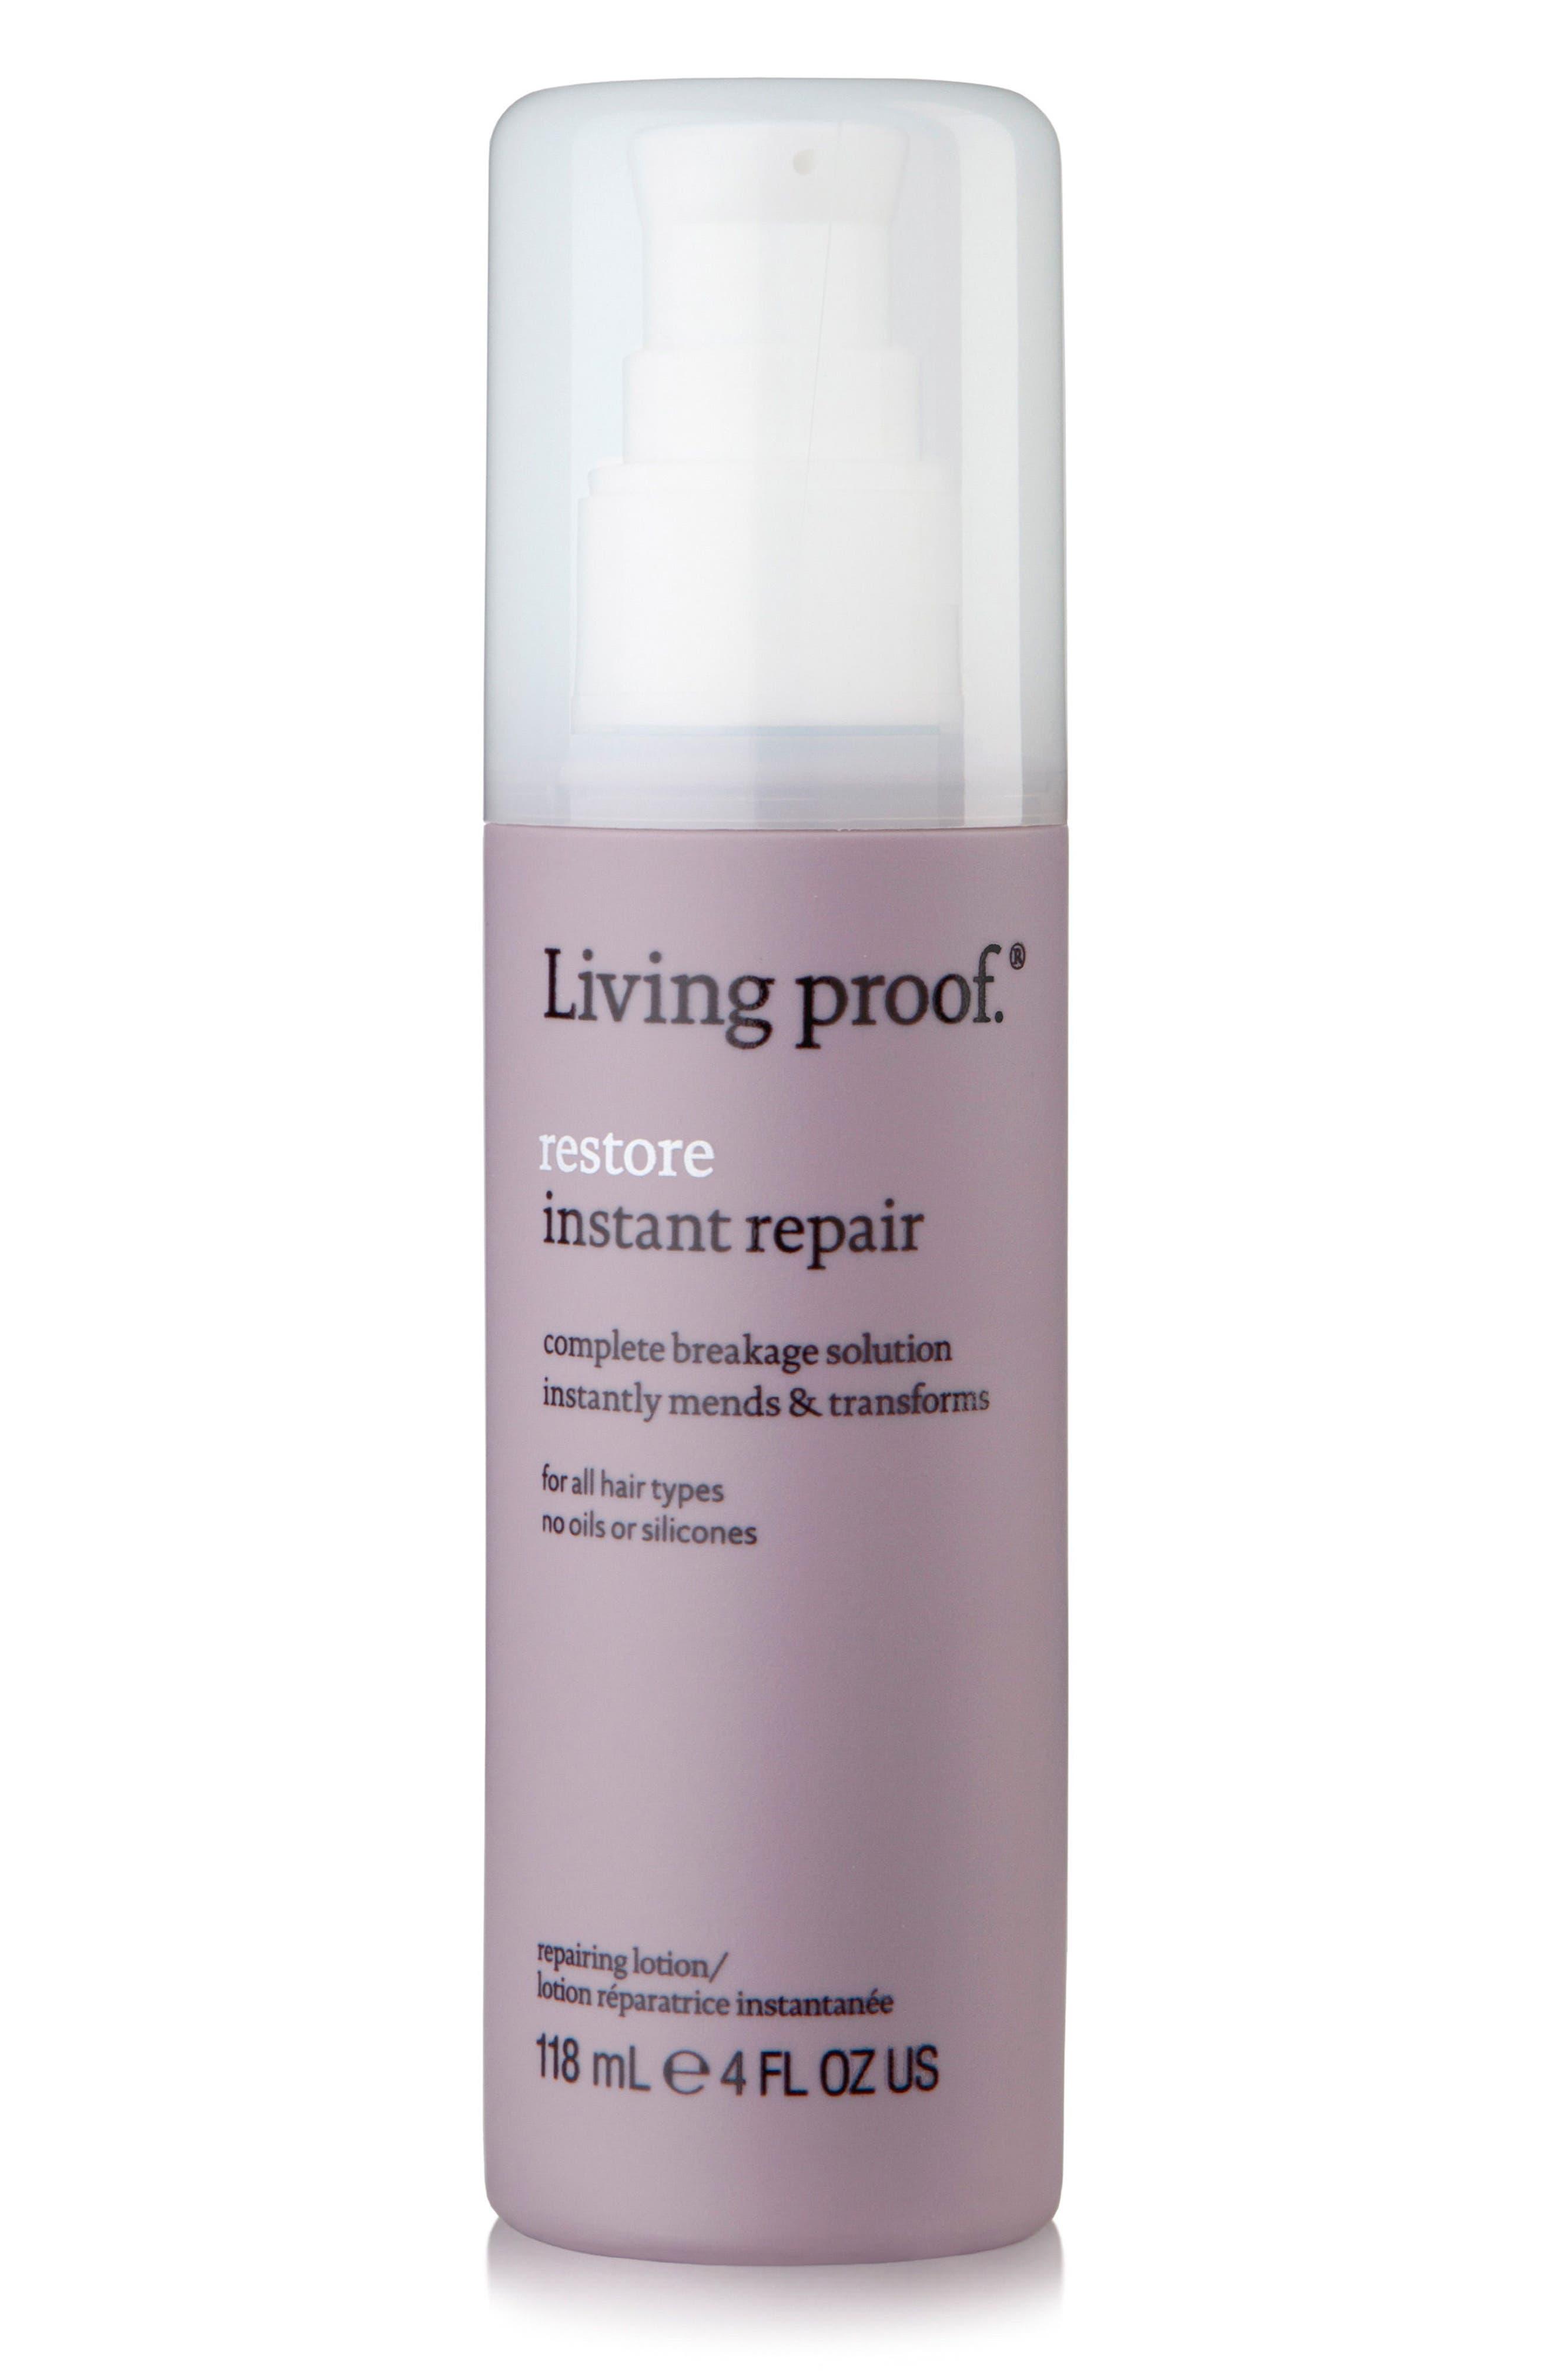 Living proof® Restore Instant Repair